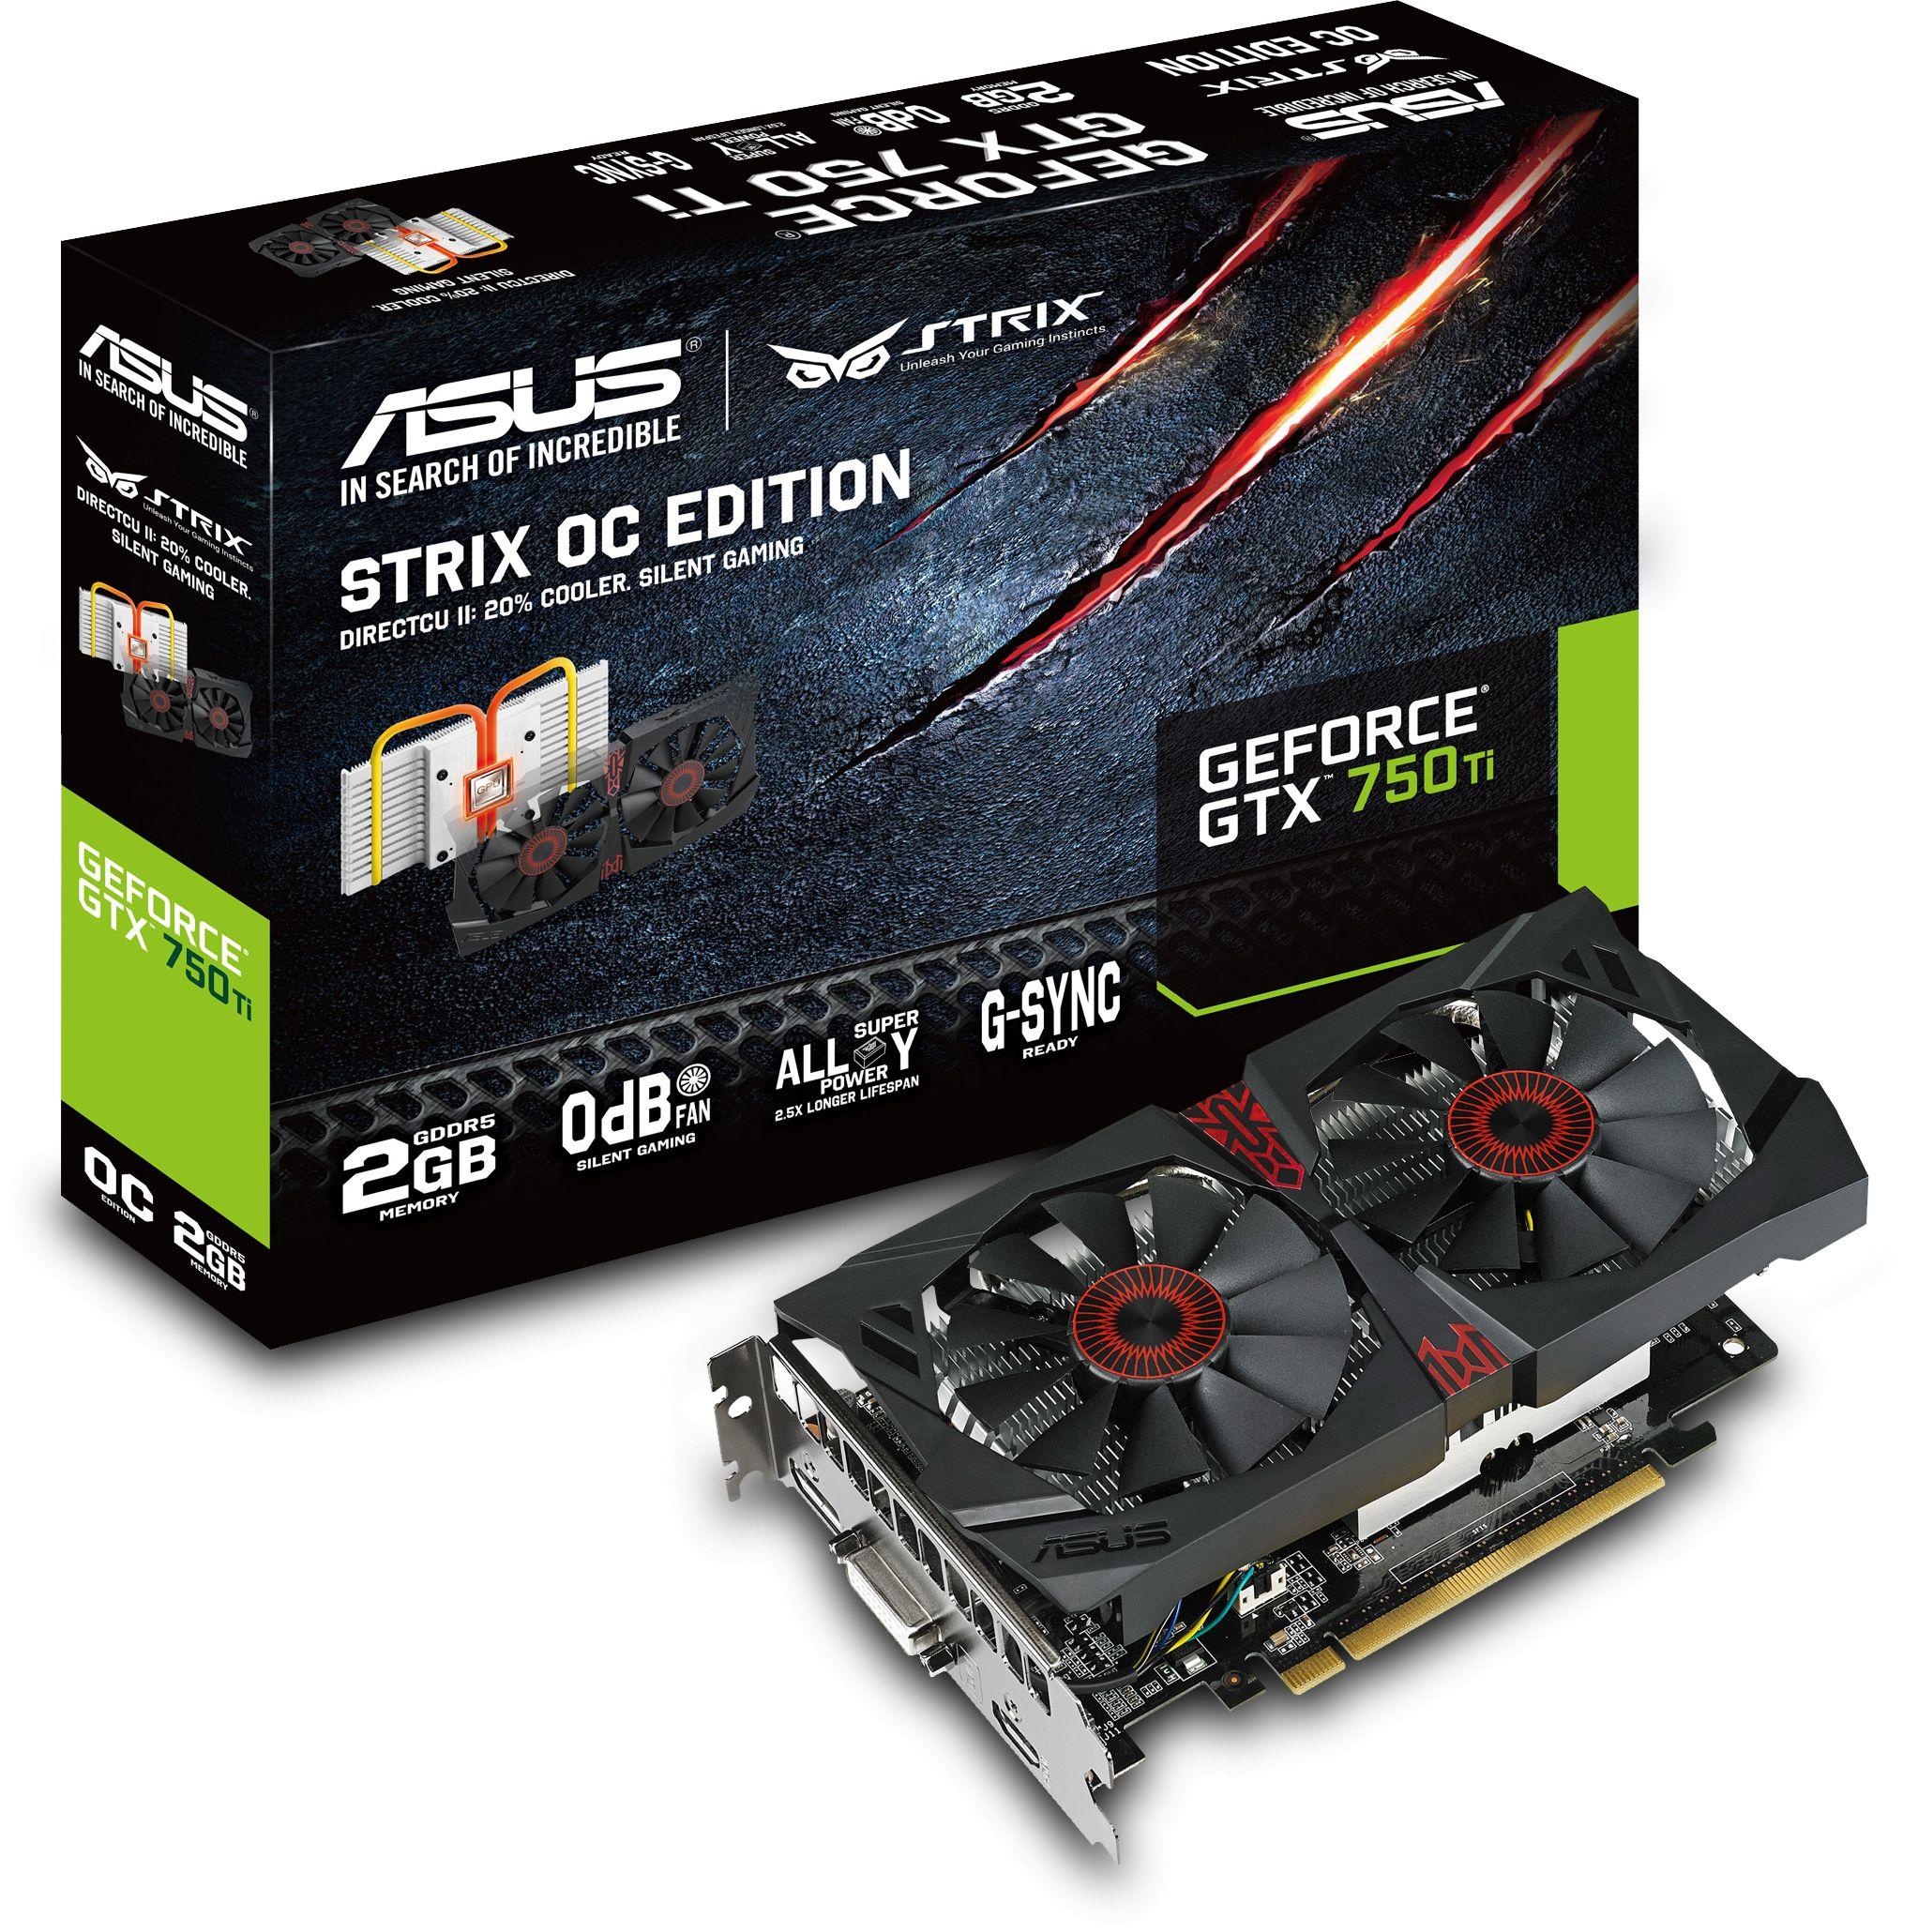 Asus announces geforce gtx 750 ti strix 4gb | techpowerup.